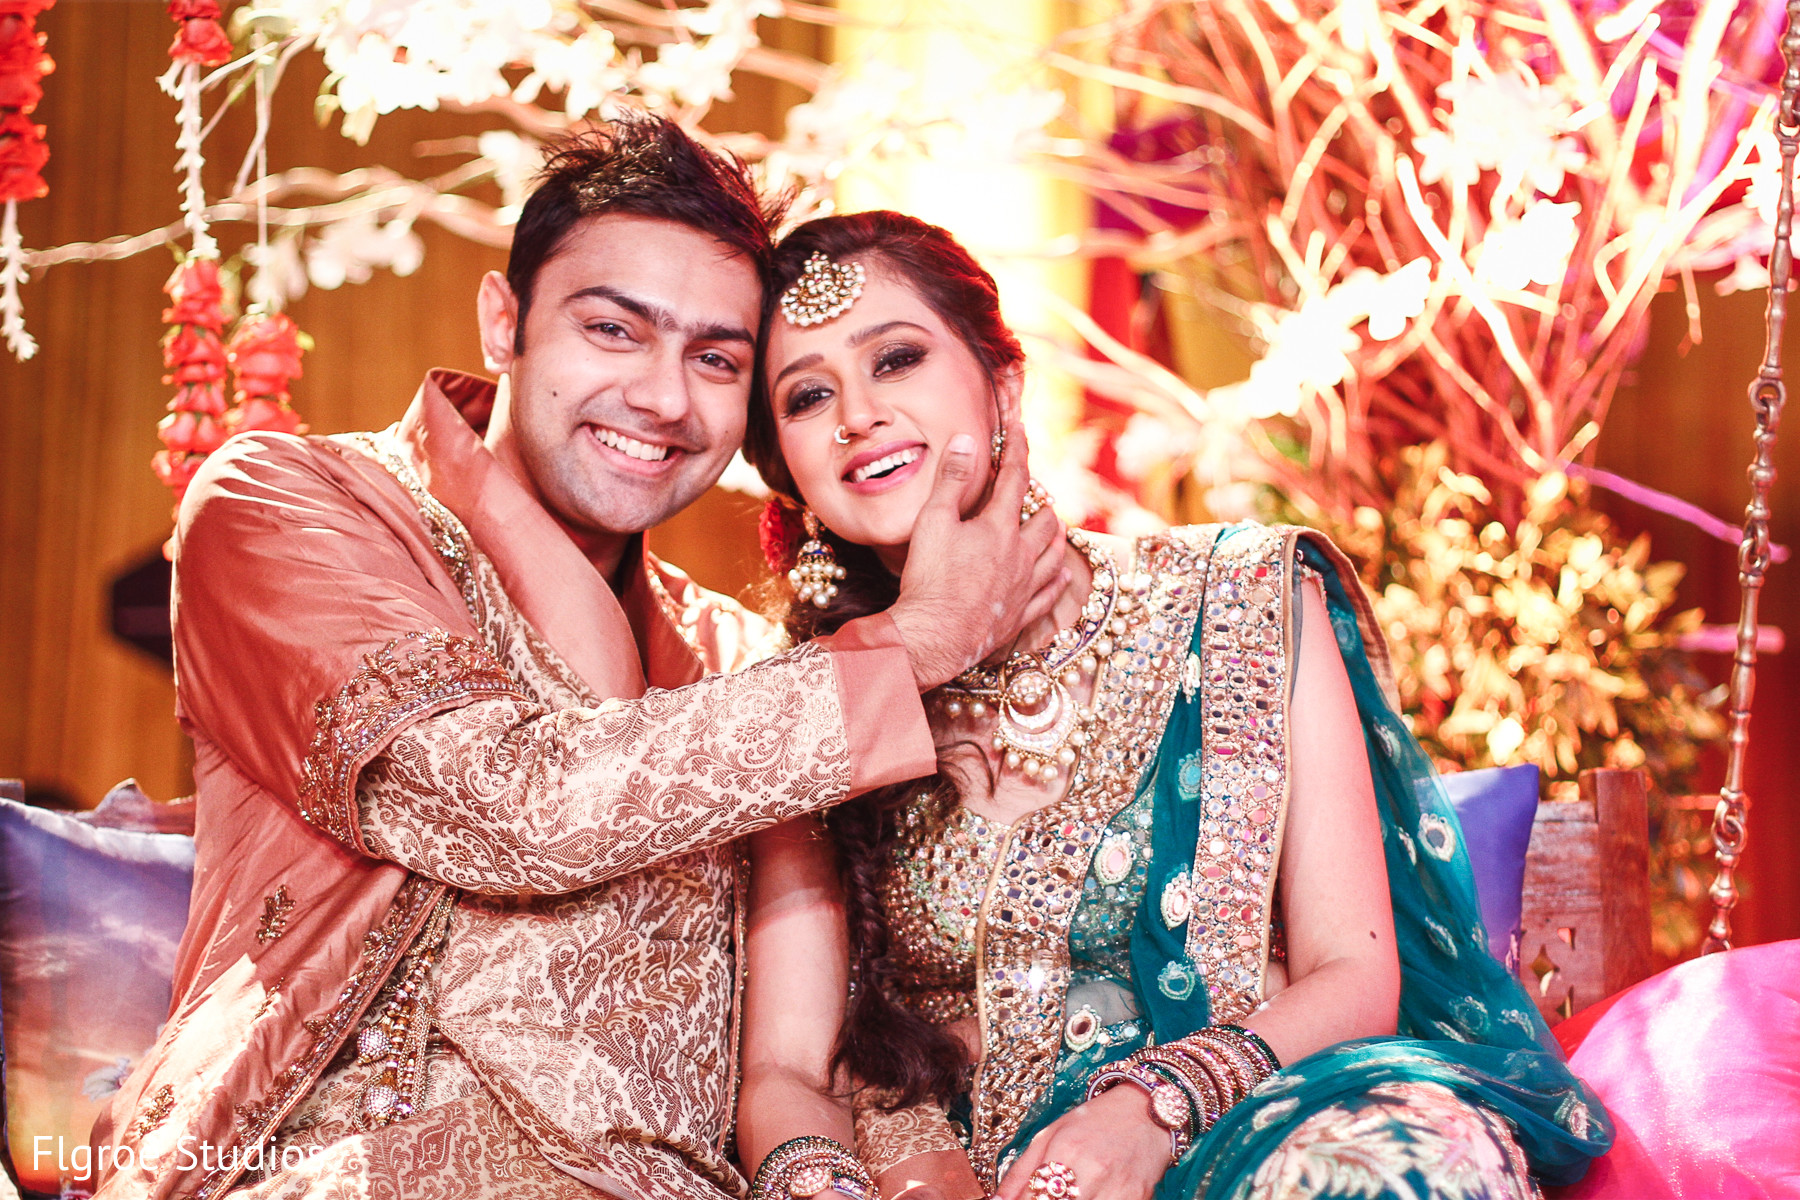 Mumbai Indian Wedding by Flgroe Studios   Post #5859